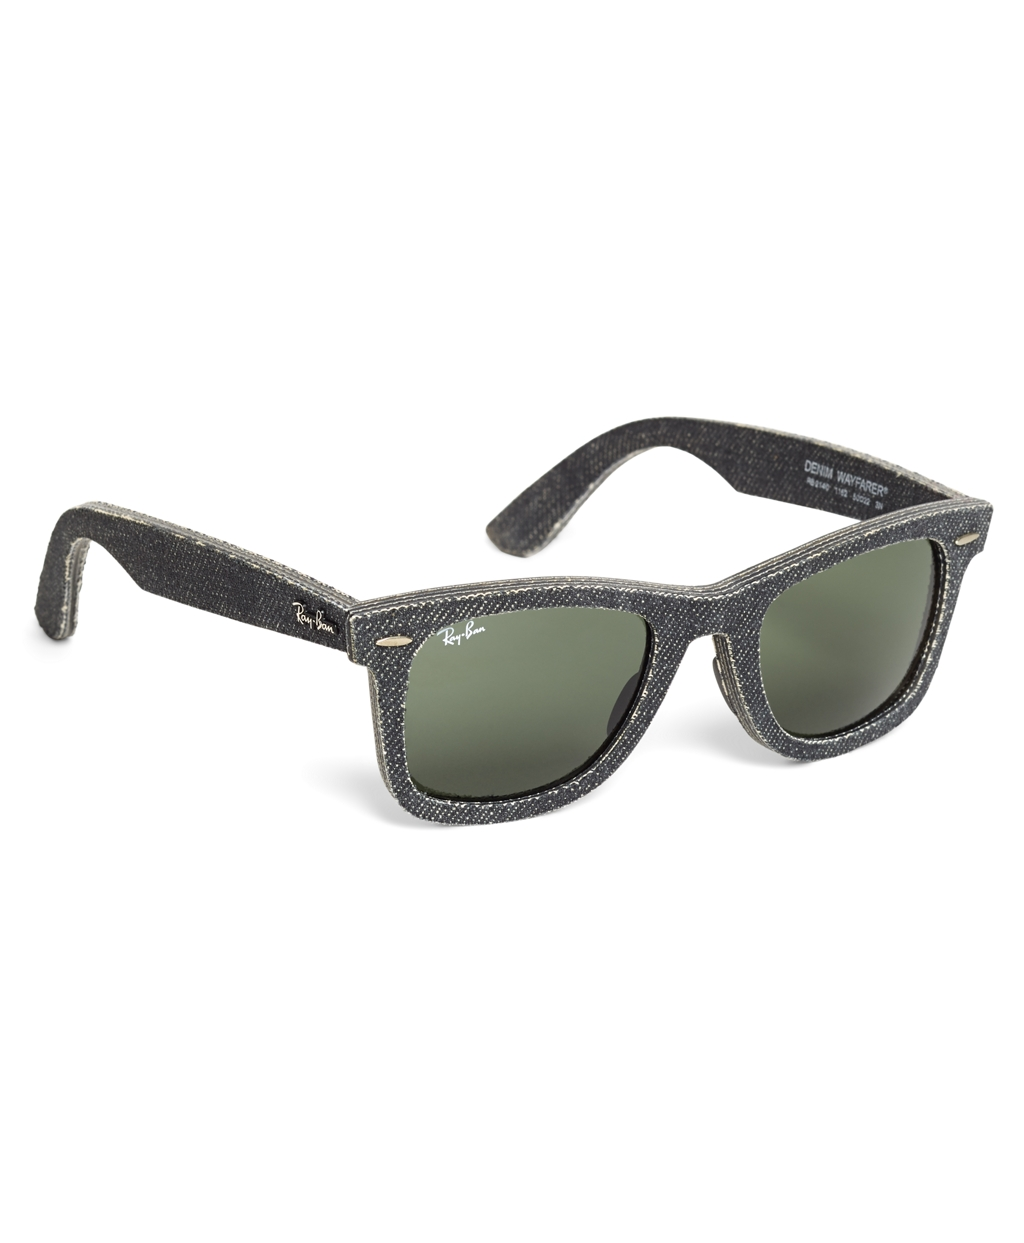 Ray-Ban Wayfarer Black Denim Sunglasses | Brooks Brothers